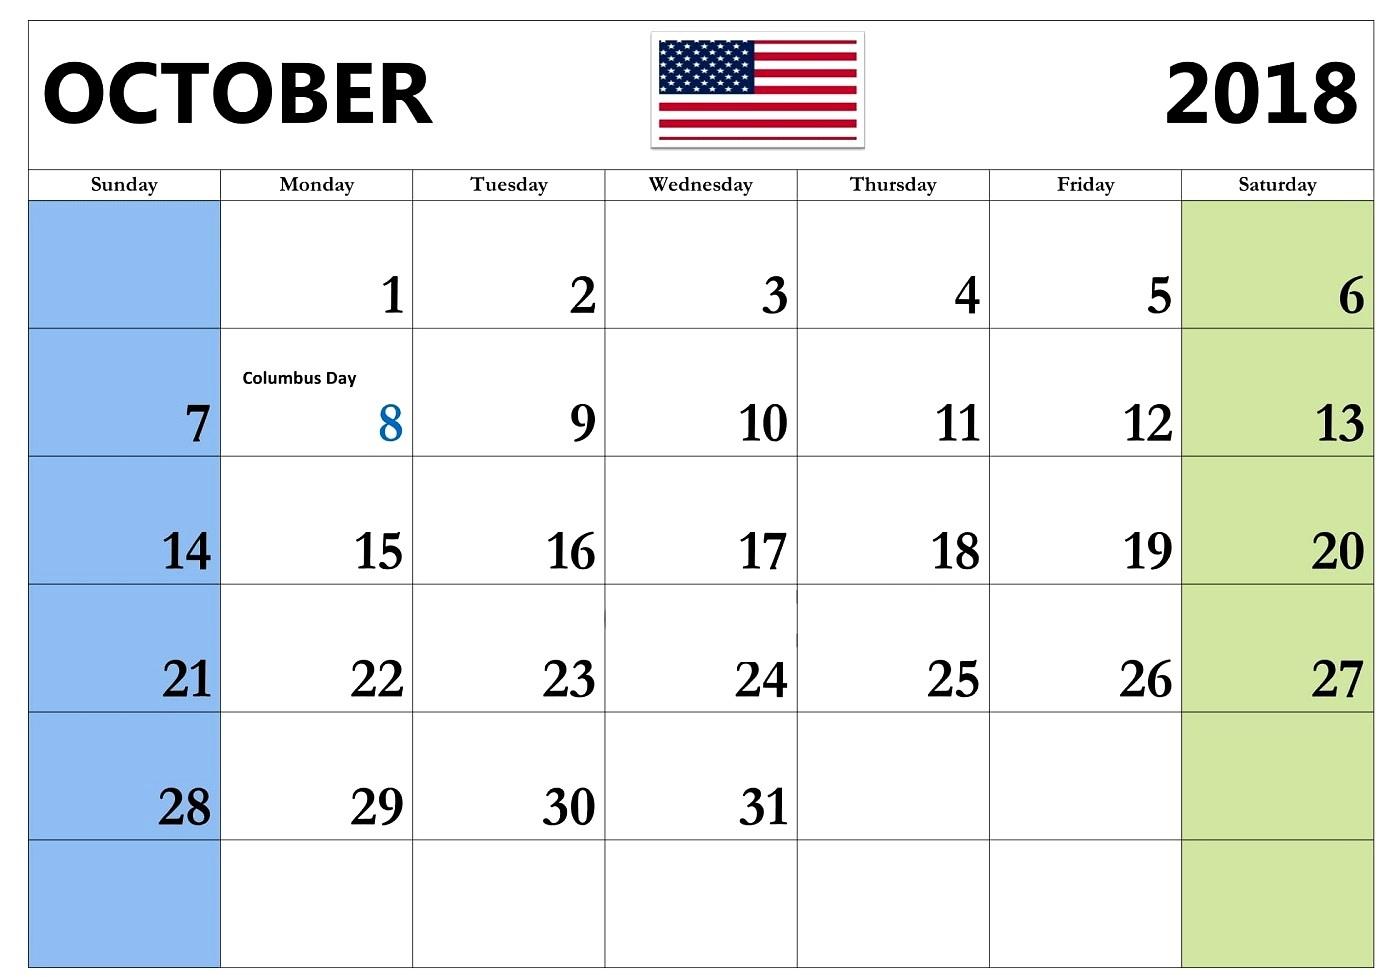 Calendar October 2018 USA